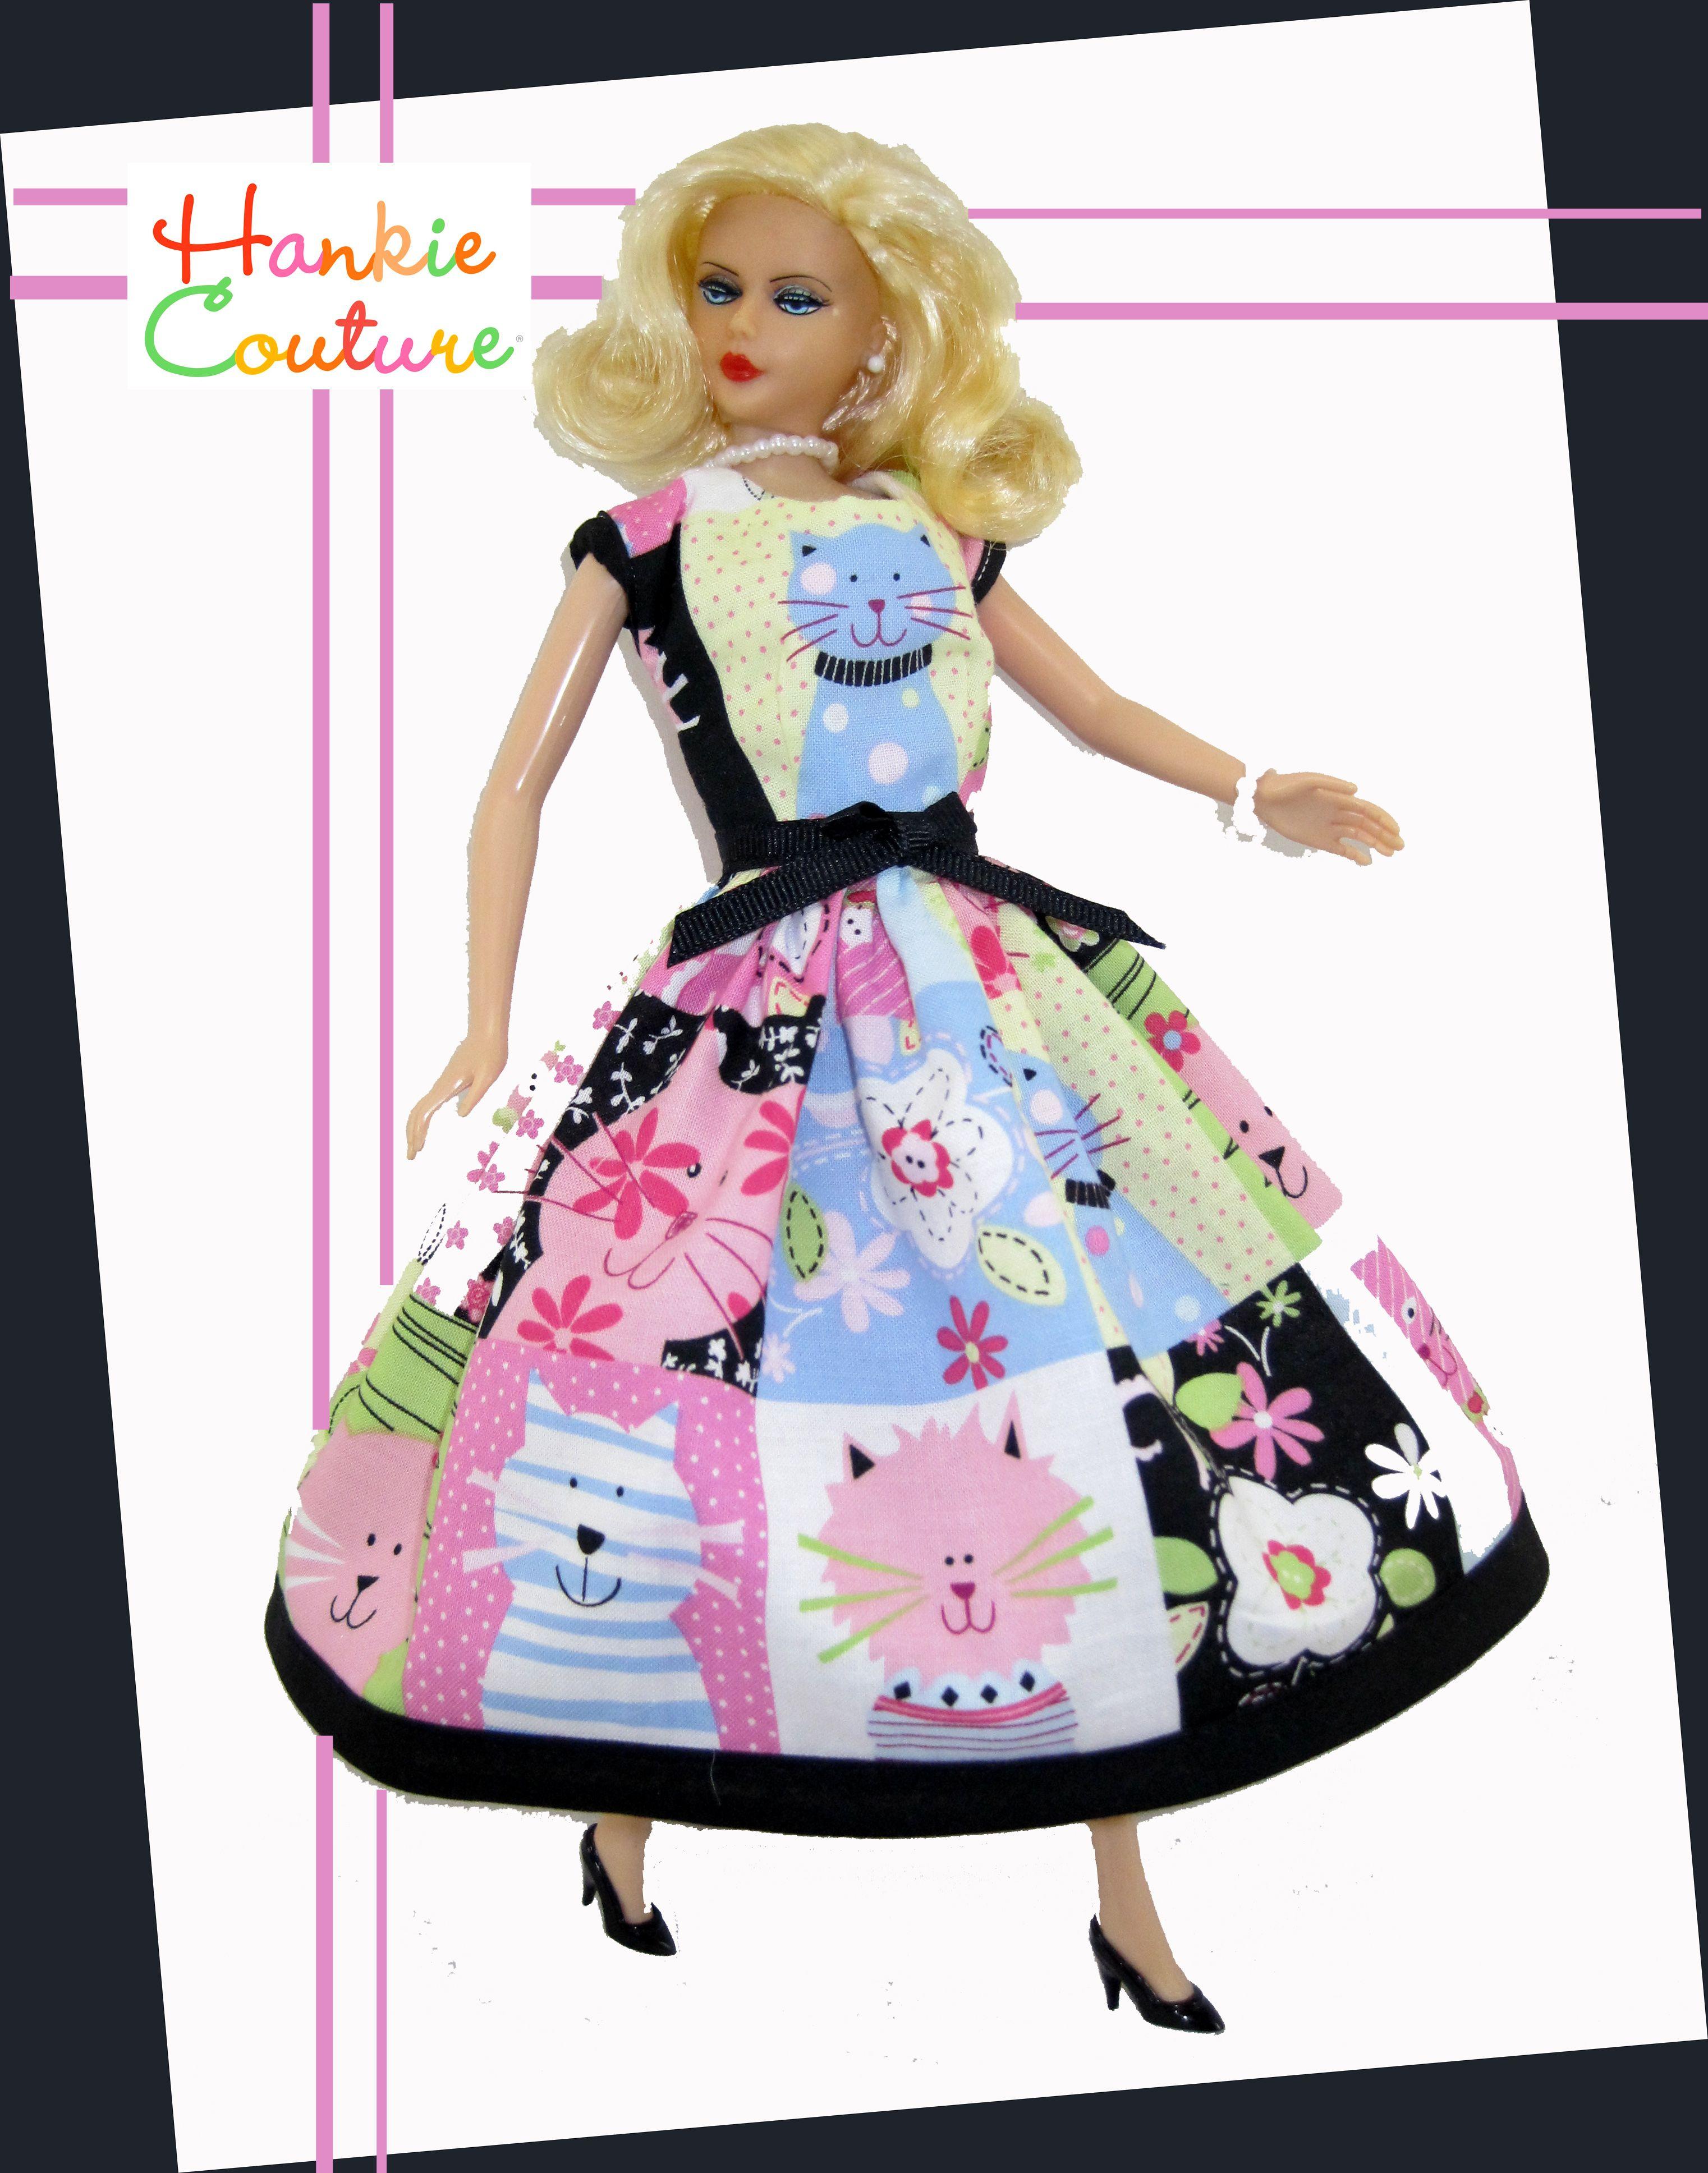 Hankie Couture cat dress!